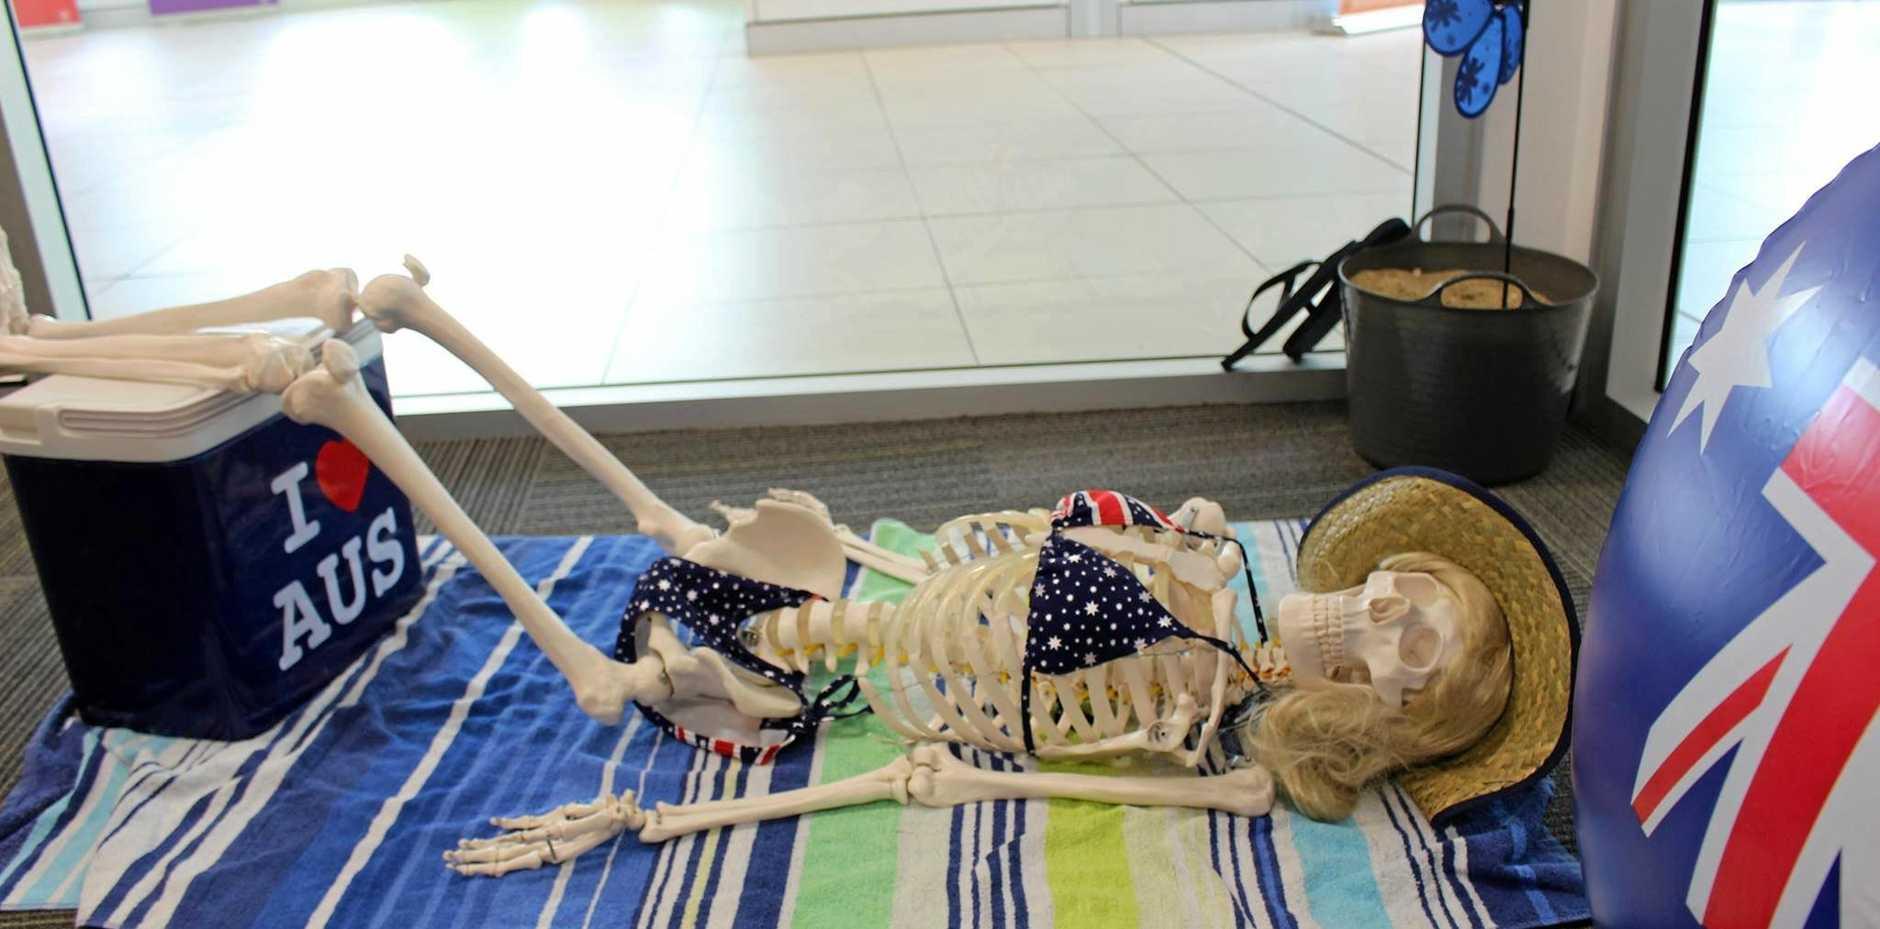 The Australia Day display at Mackay Base Hospital's Medical Imaging department.